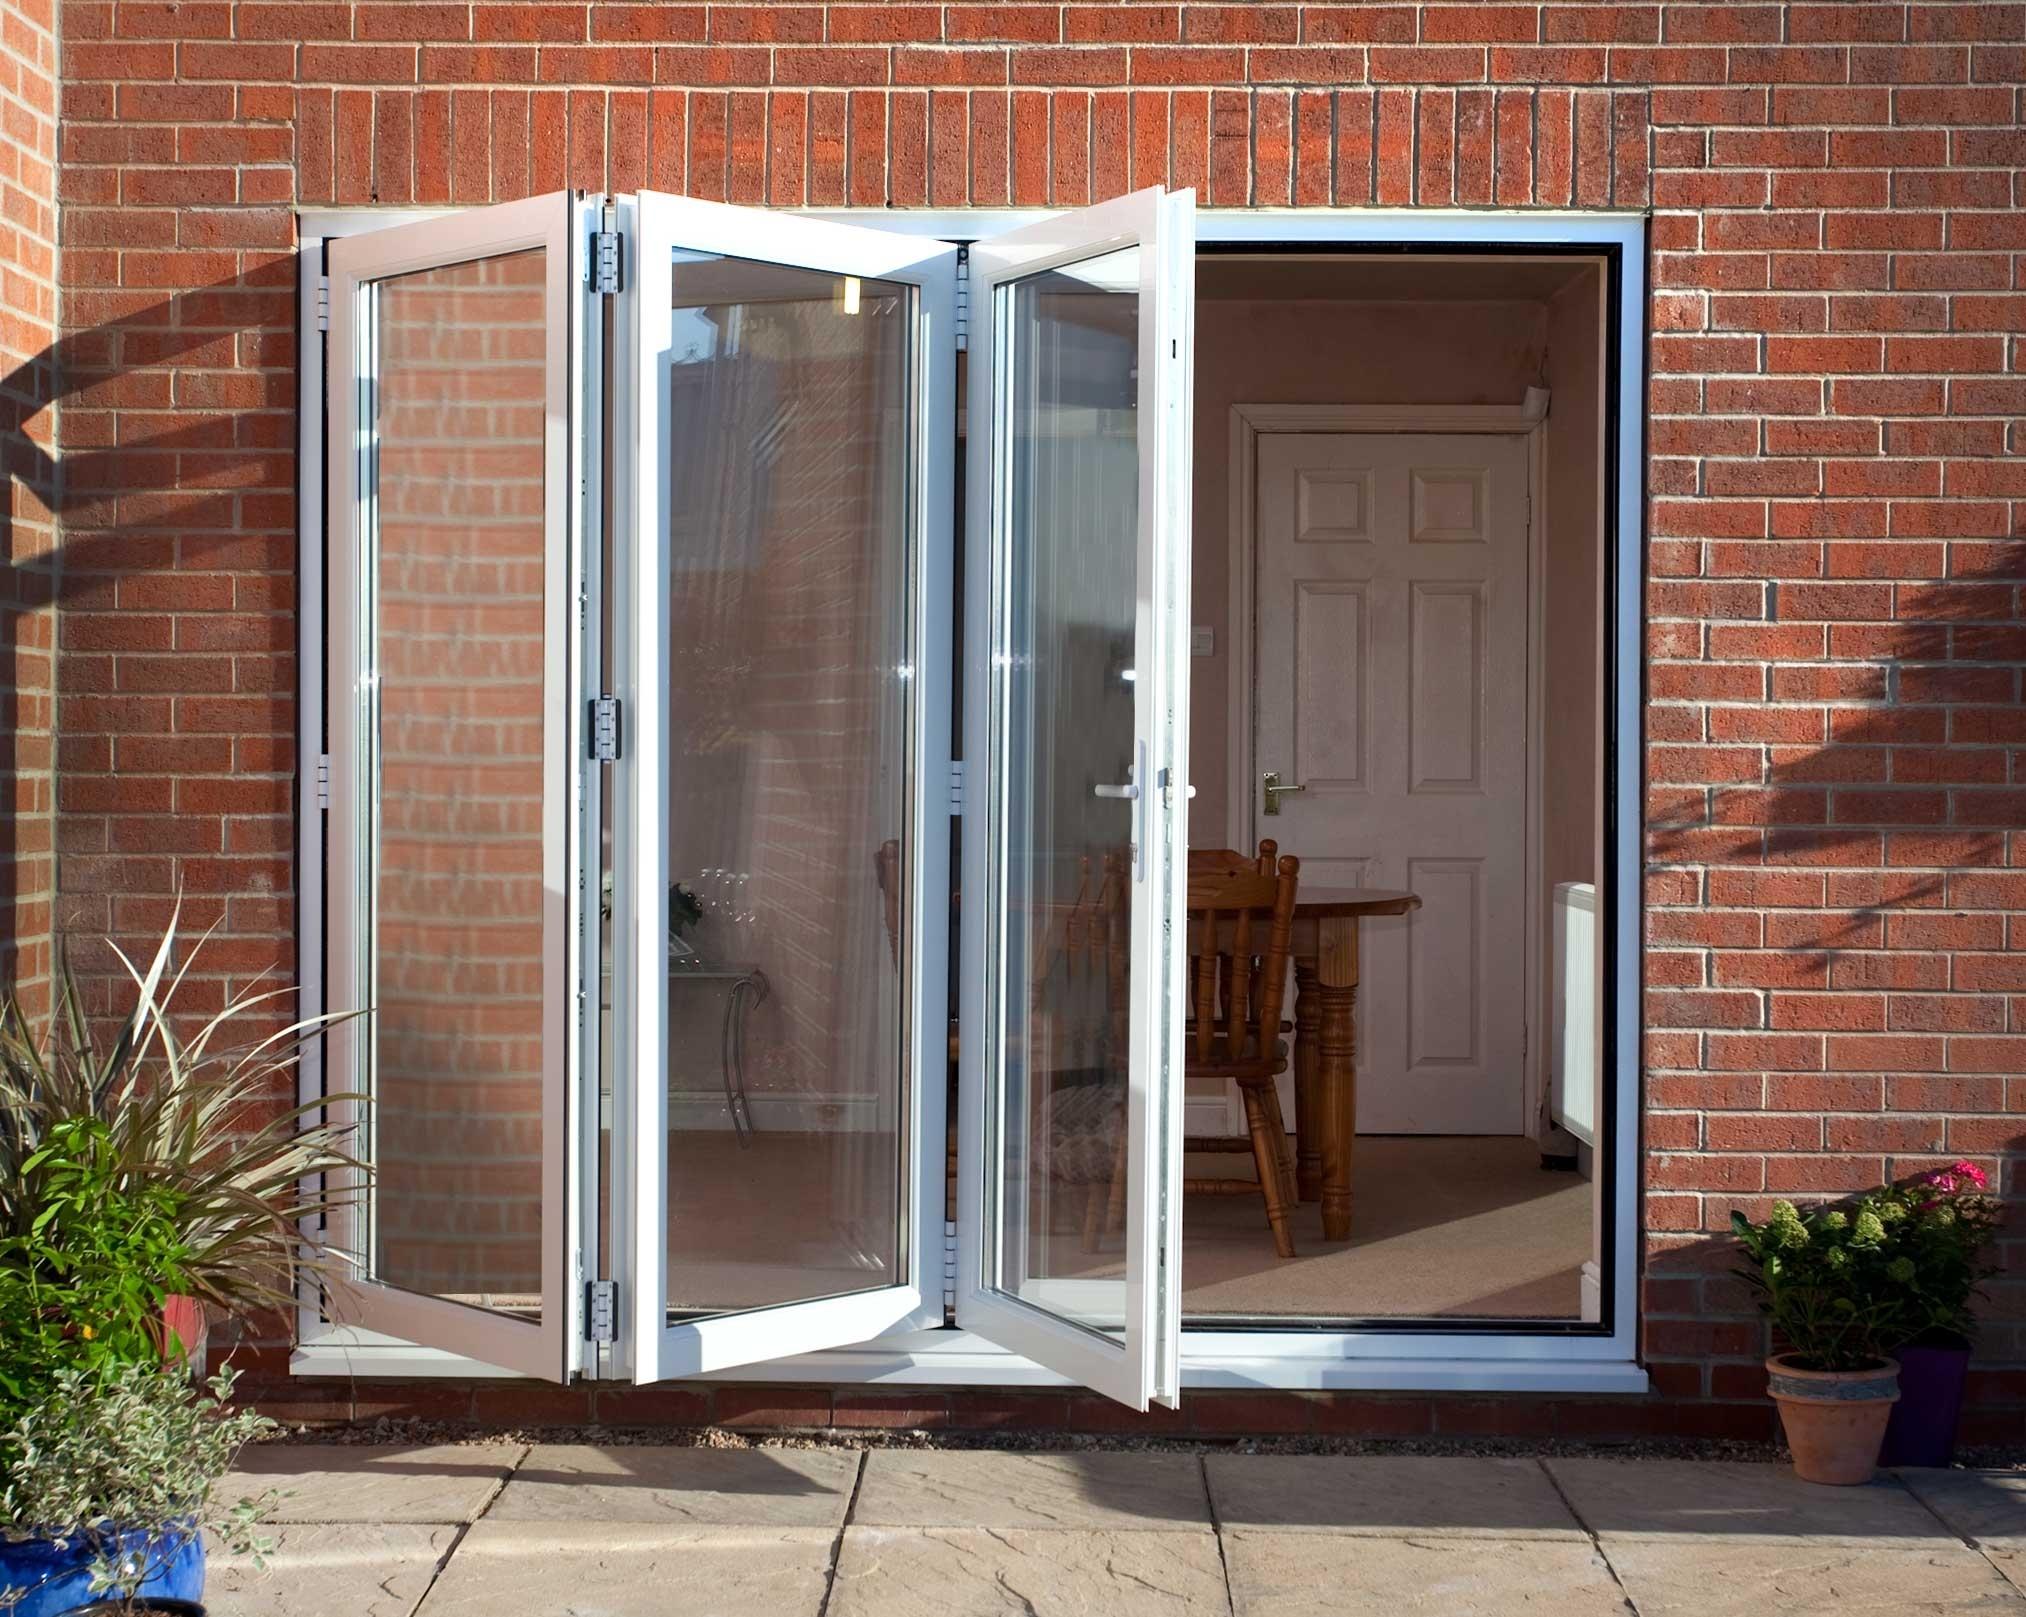 9 Foot Sliding Screen Door9 foot sliding screen door sliding doors design